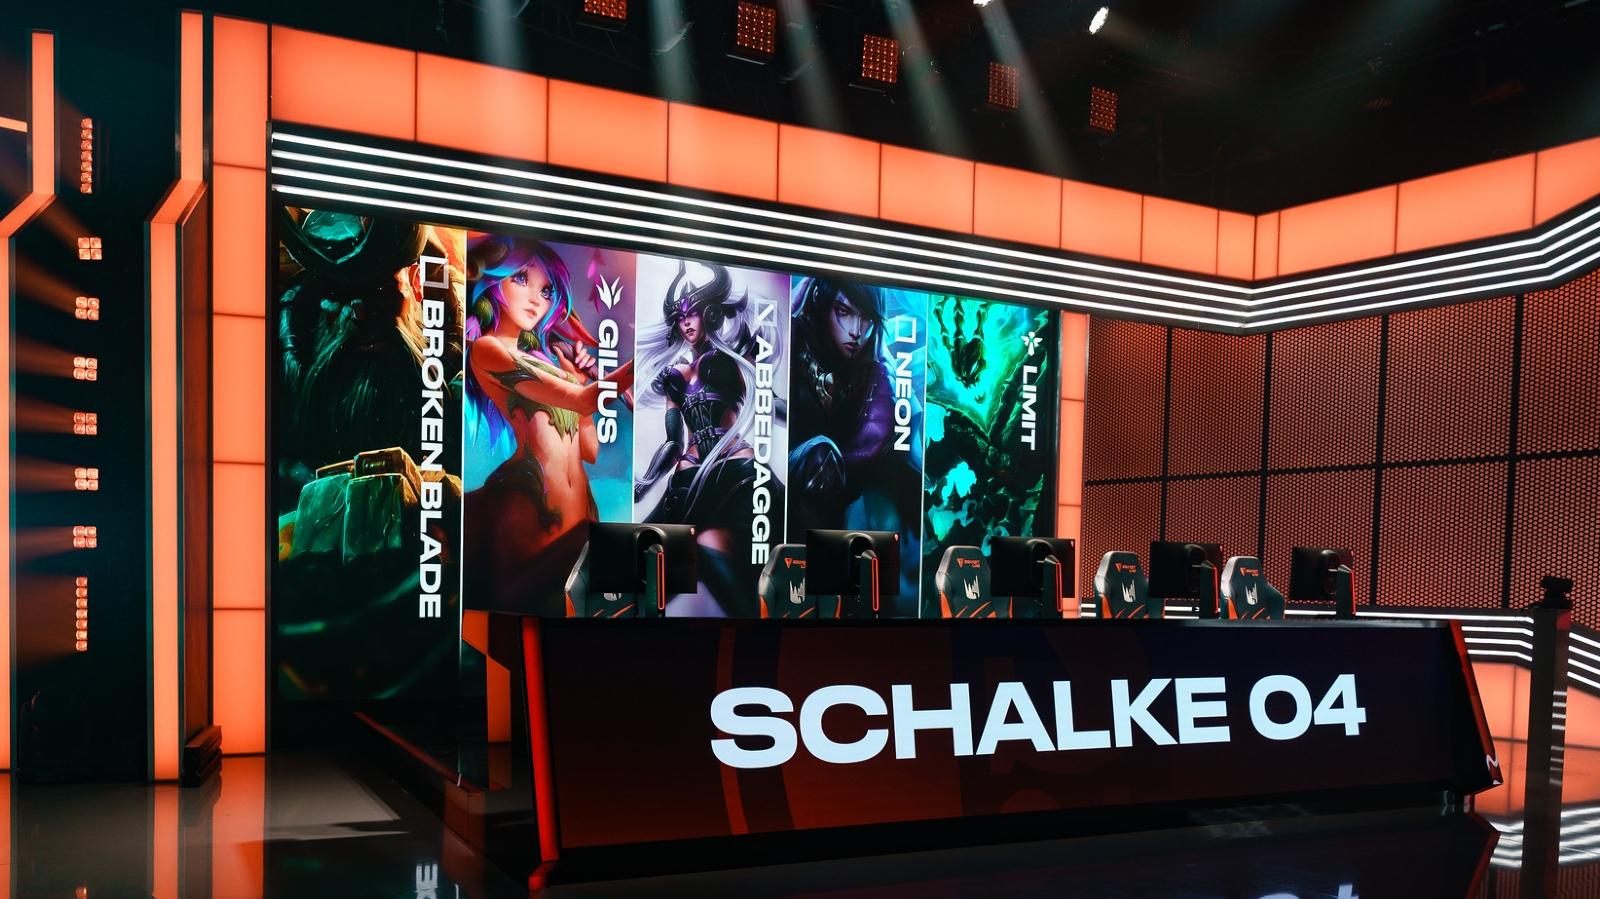 Schalke_04_reportedly_selling_LEC_slot_for_20_million_euroes